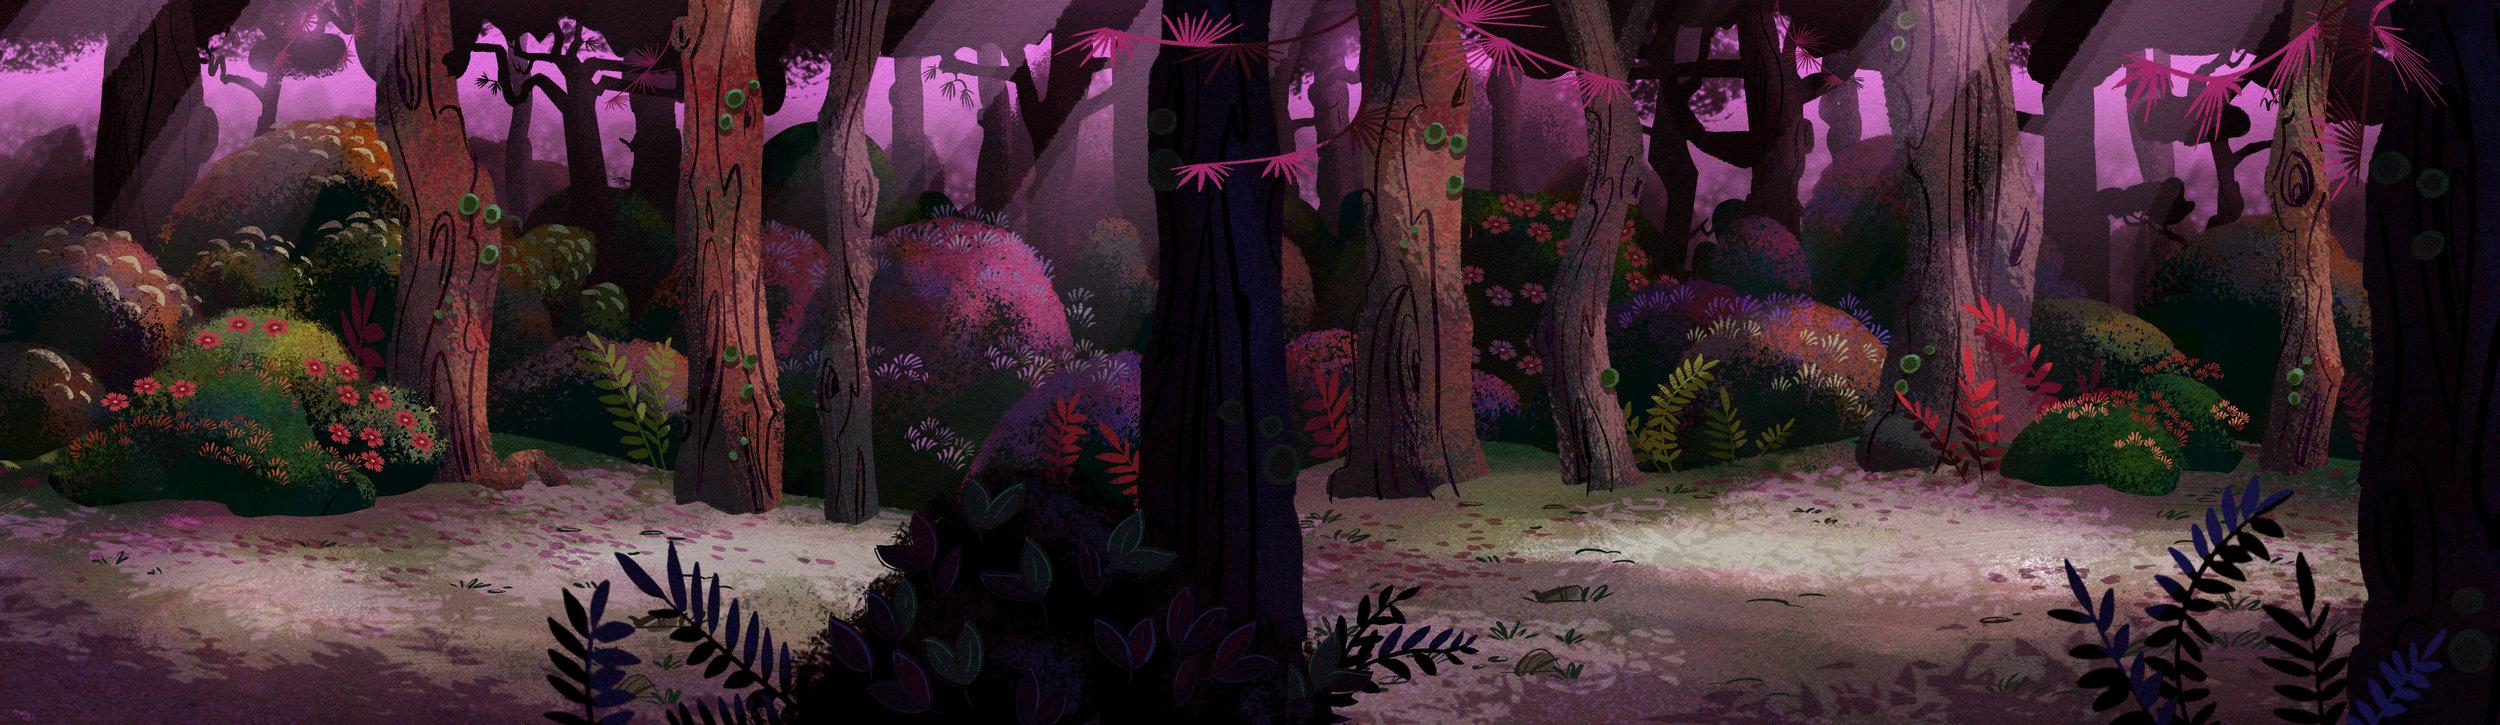 482M_404Sc37_44_49_50_Mickey_And_Minnie_Near_Trees.jpg